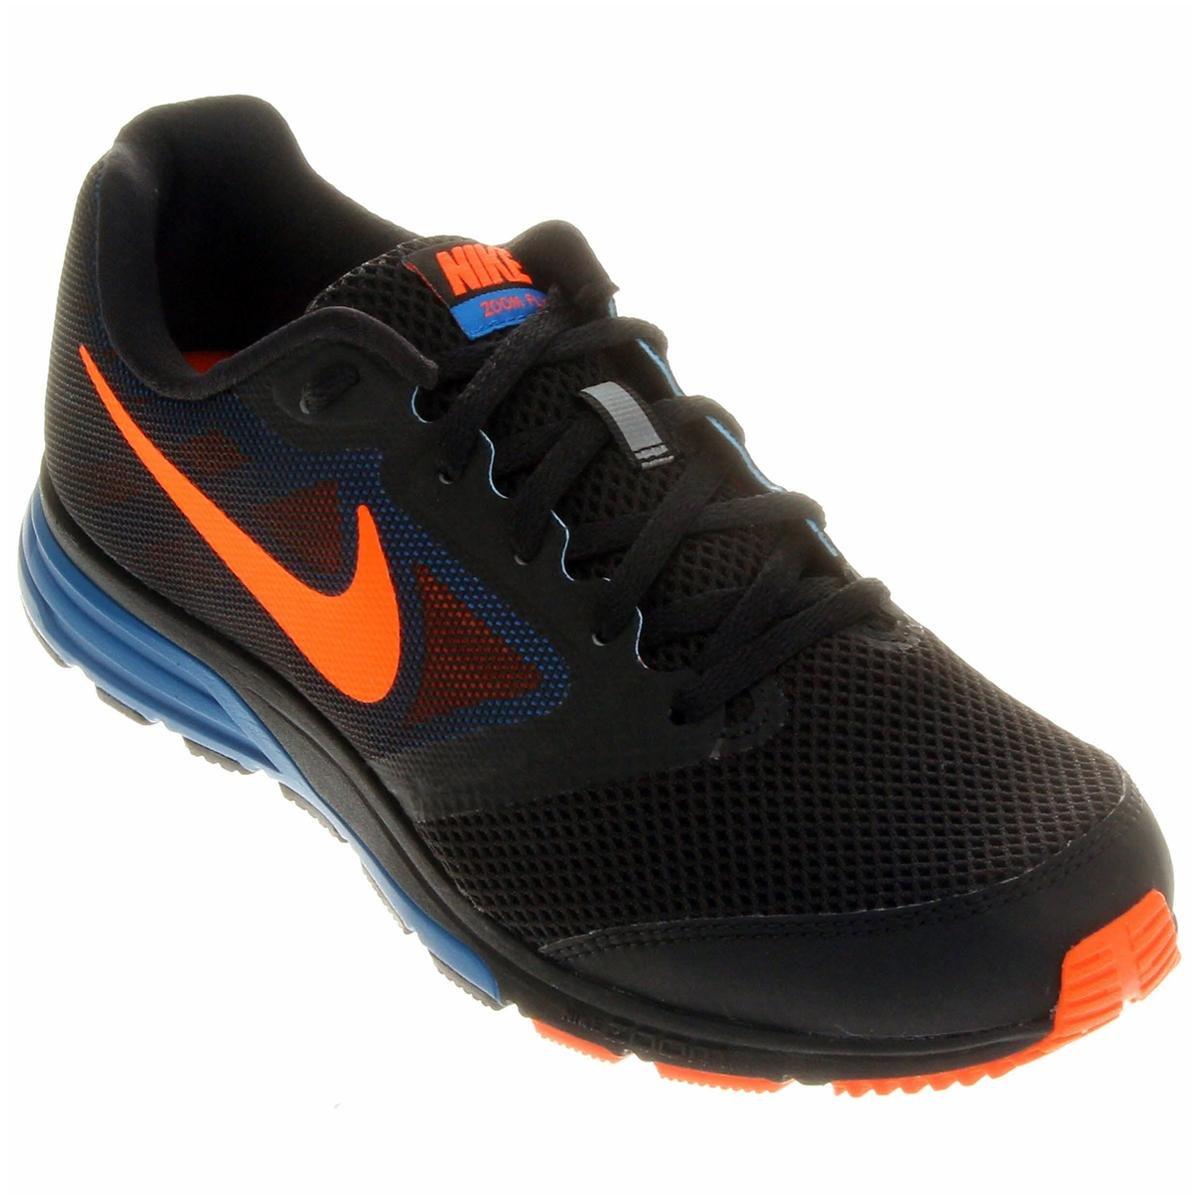 58053dd4a5e62 Tênis Nike Zoom Fly - Compre Agora